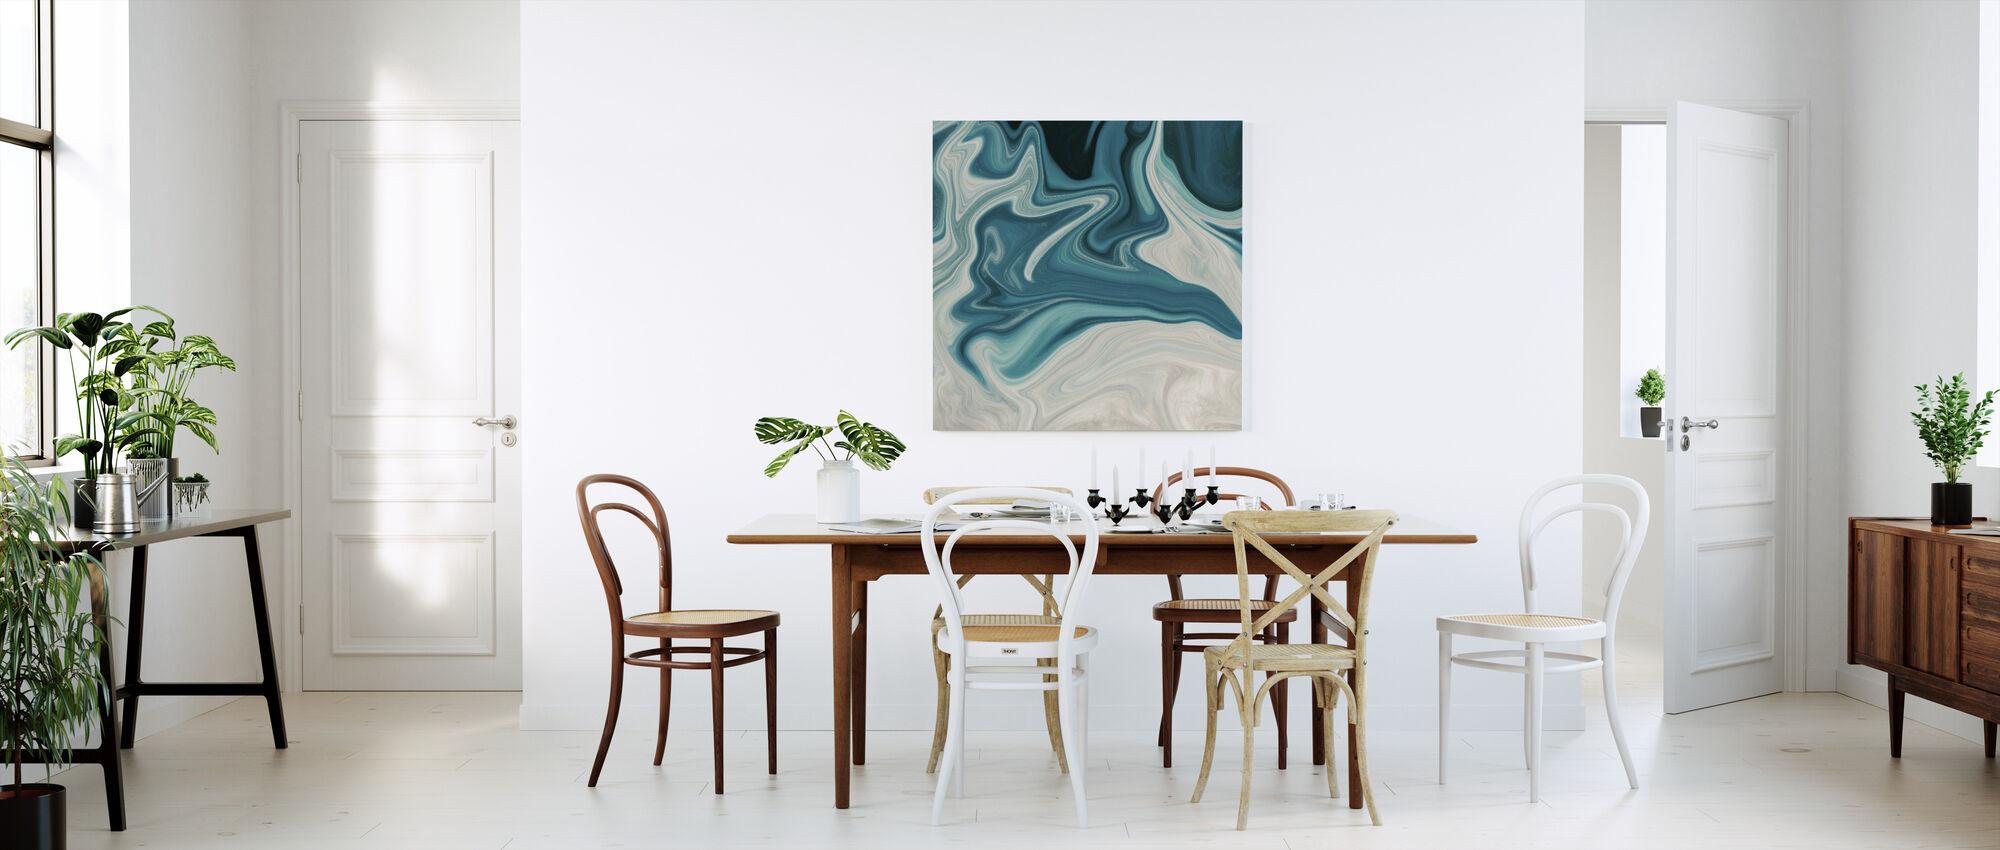 Sea of Marble - Canvas print - Kitchen